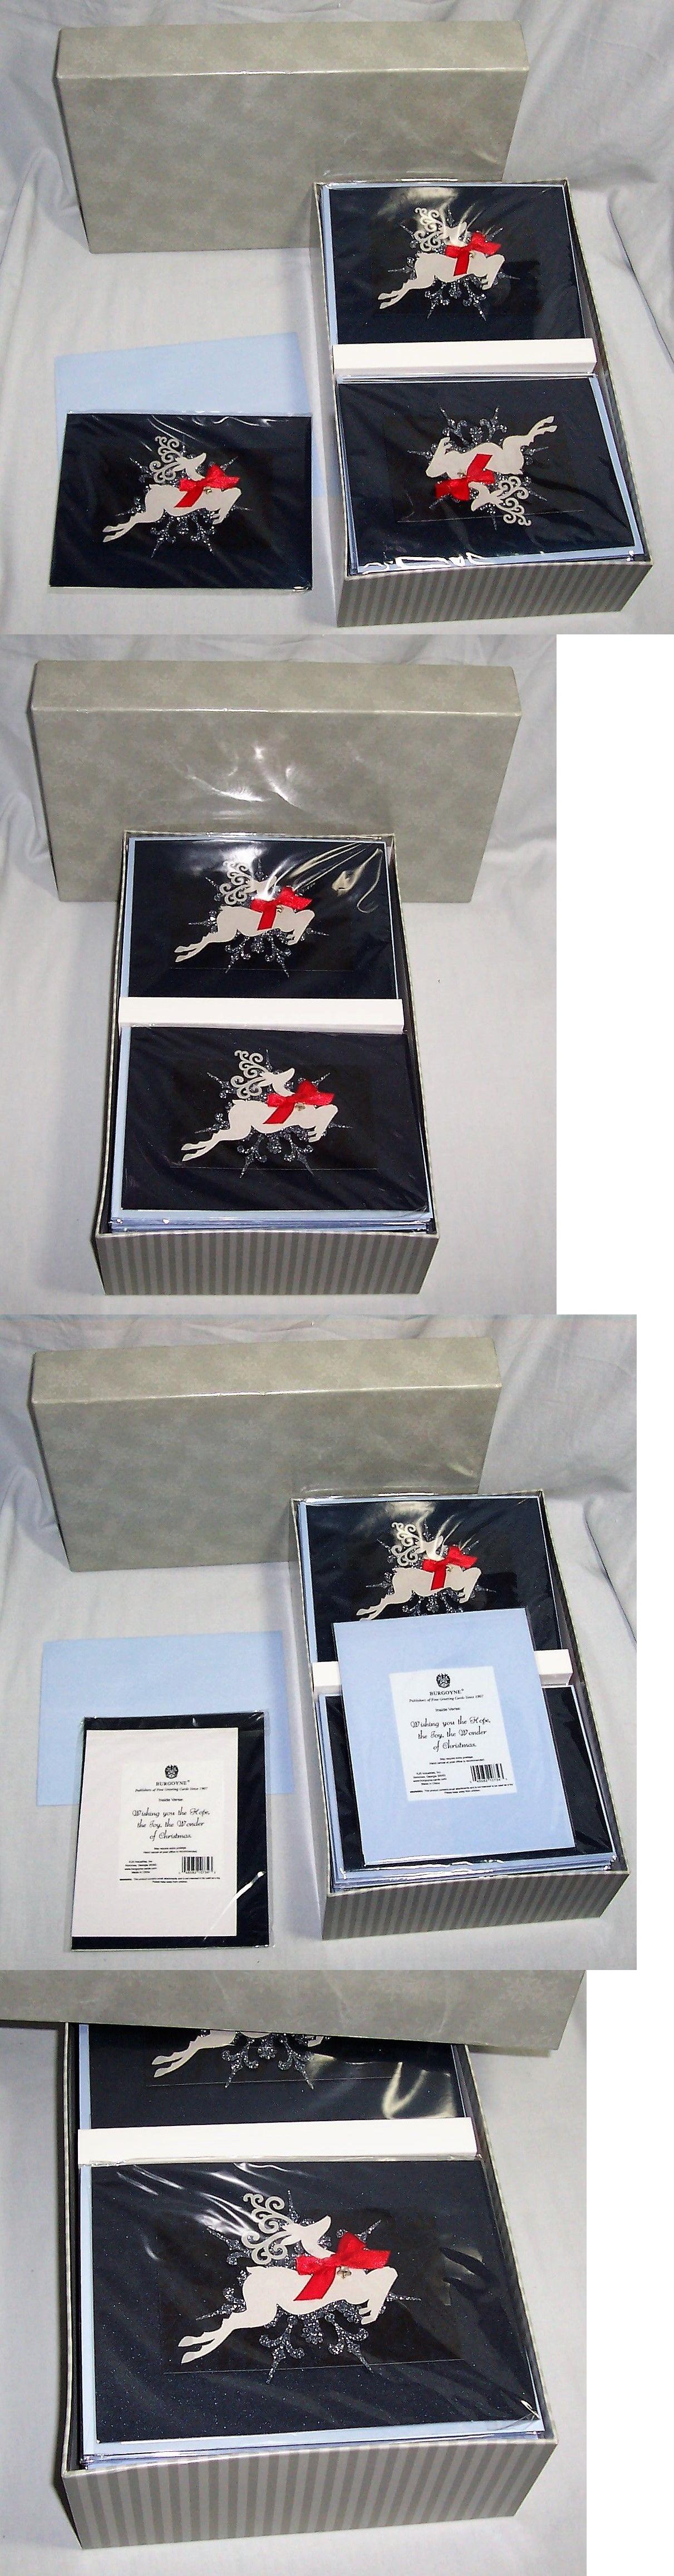 Greeting Cards And Invitations 170098 New Box Of 30 Burgoyne